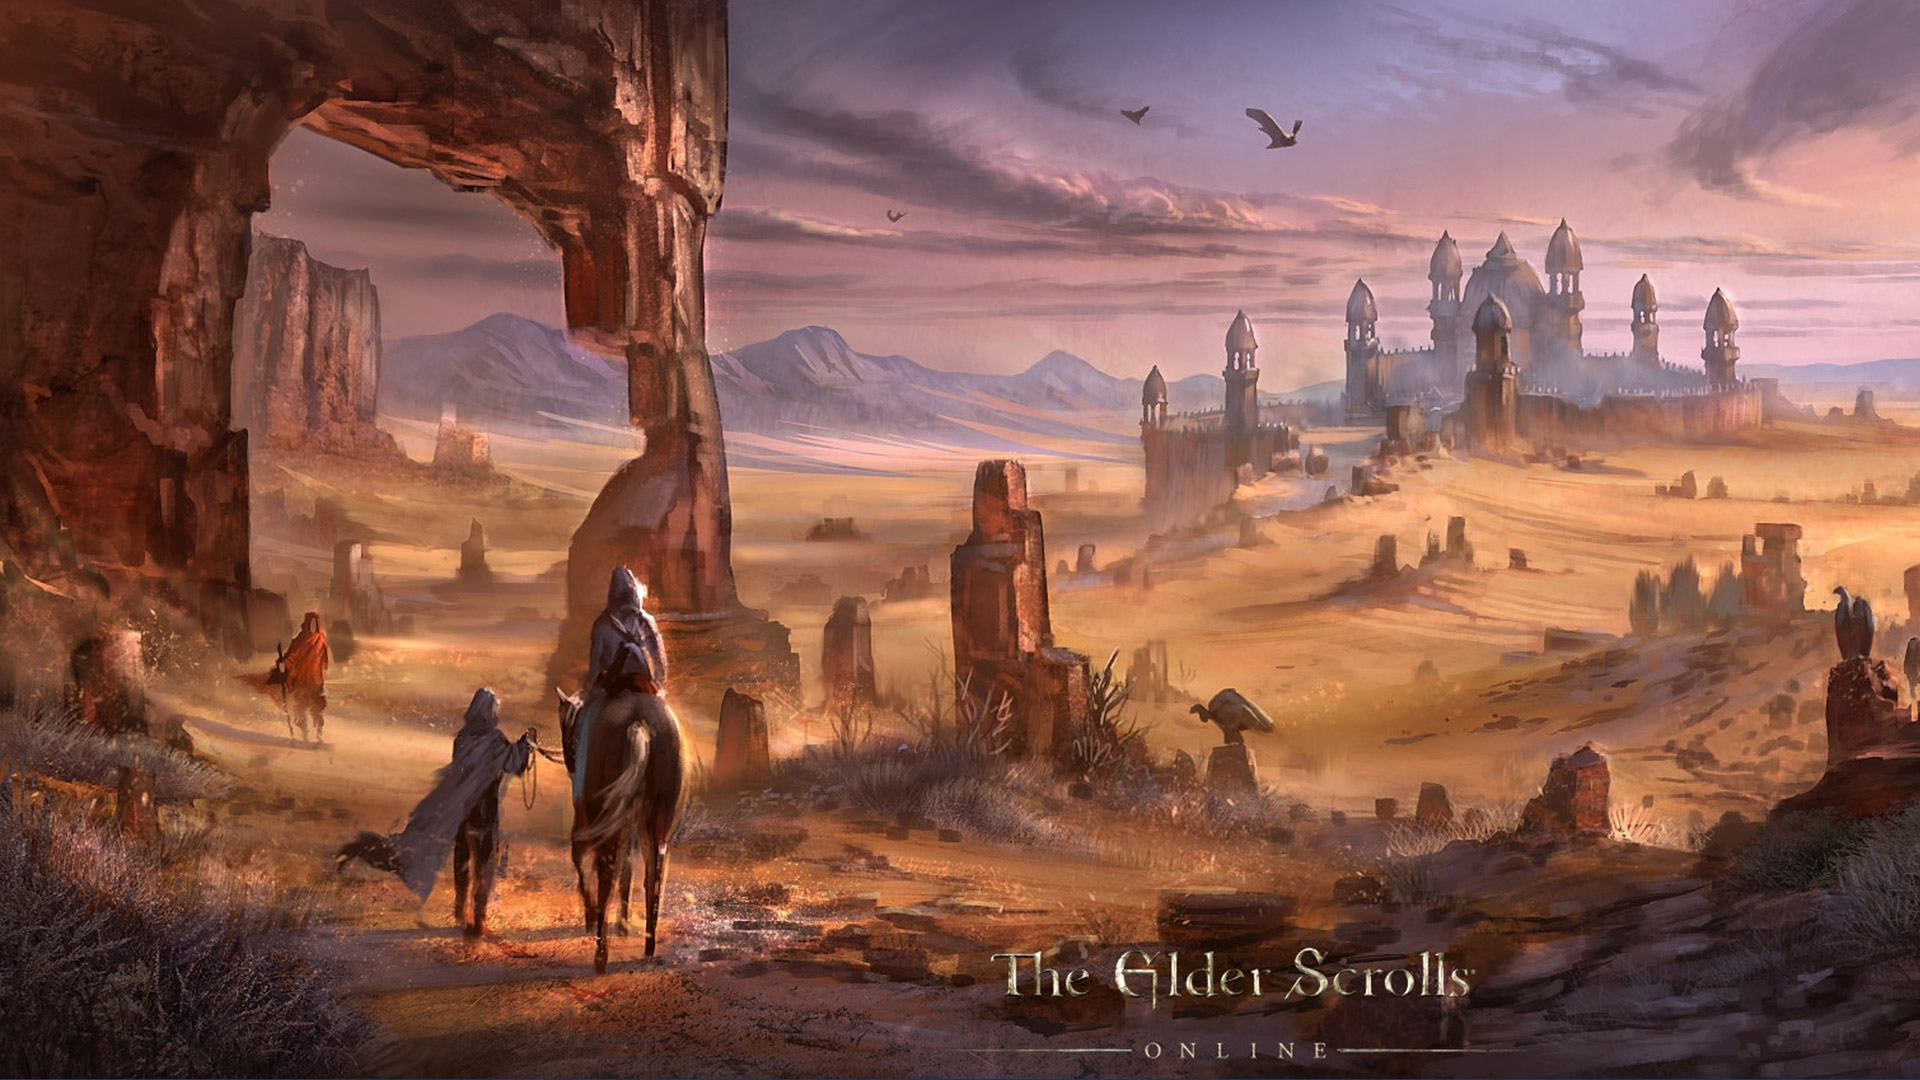 the-elder-scrolls-online-19032013